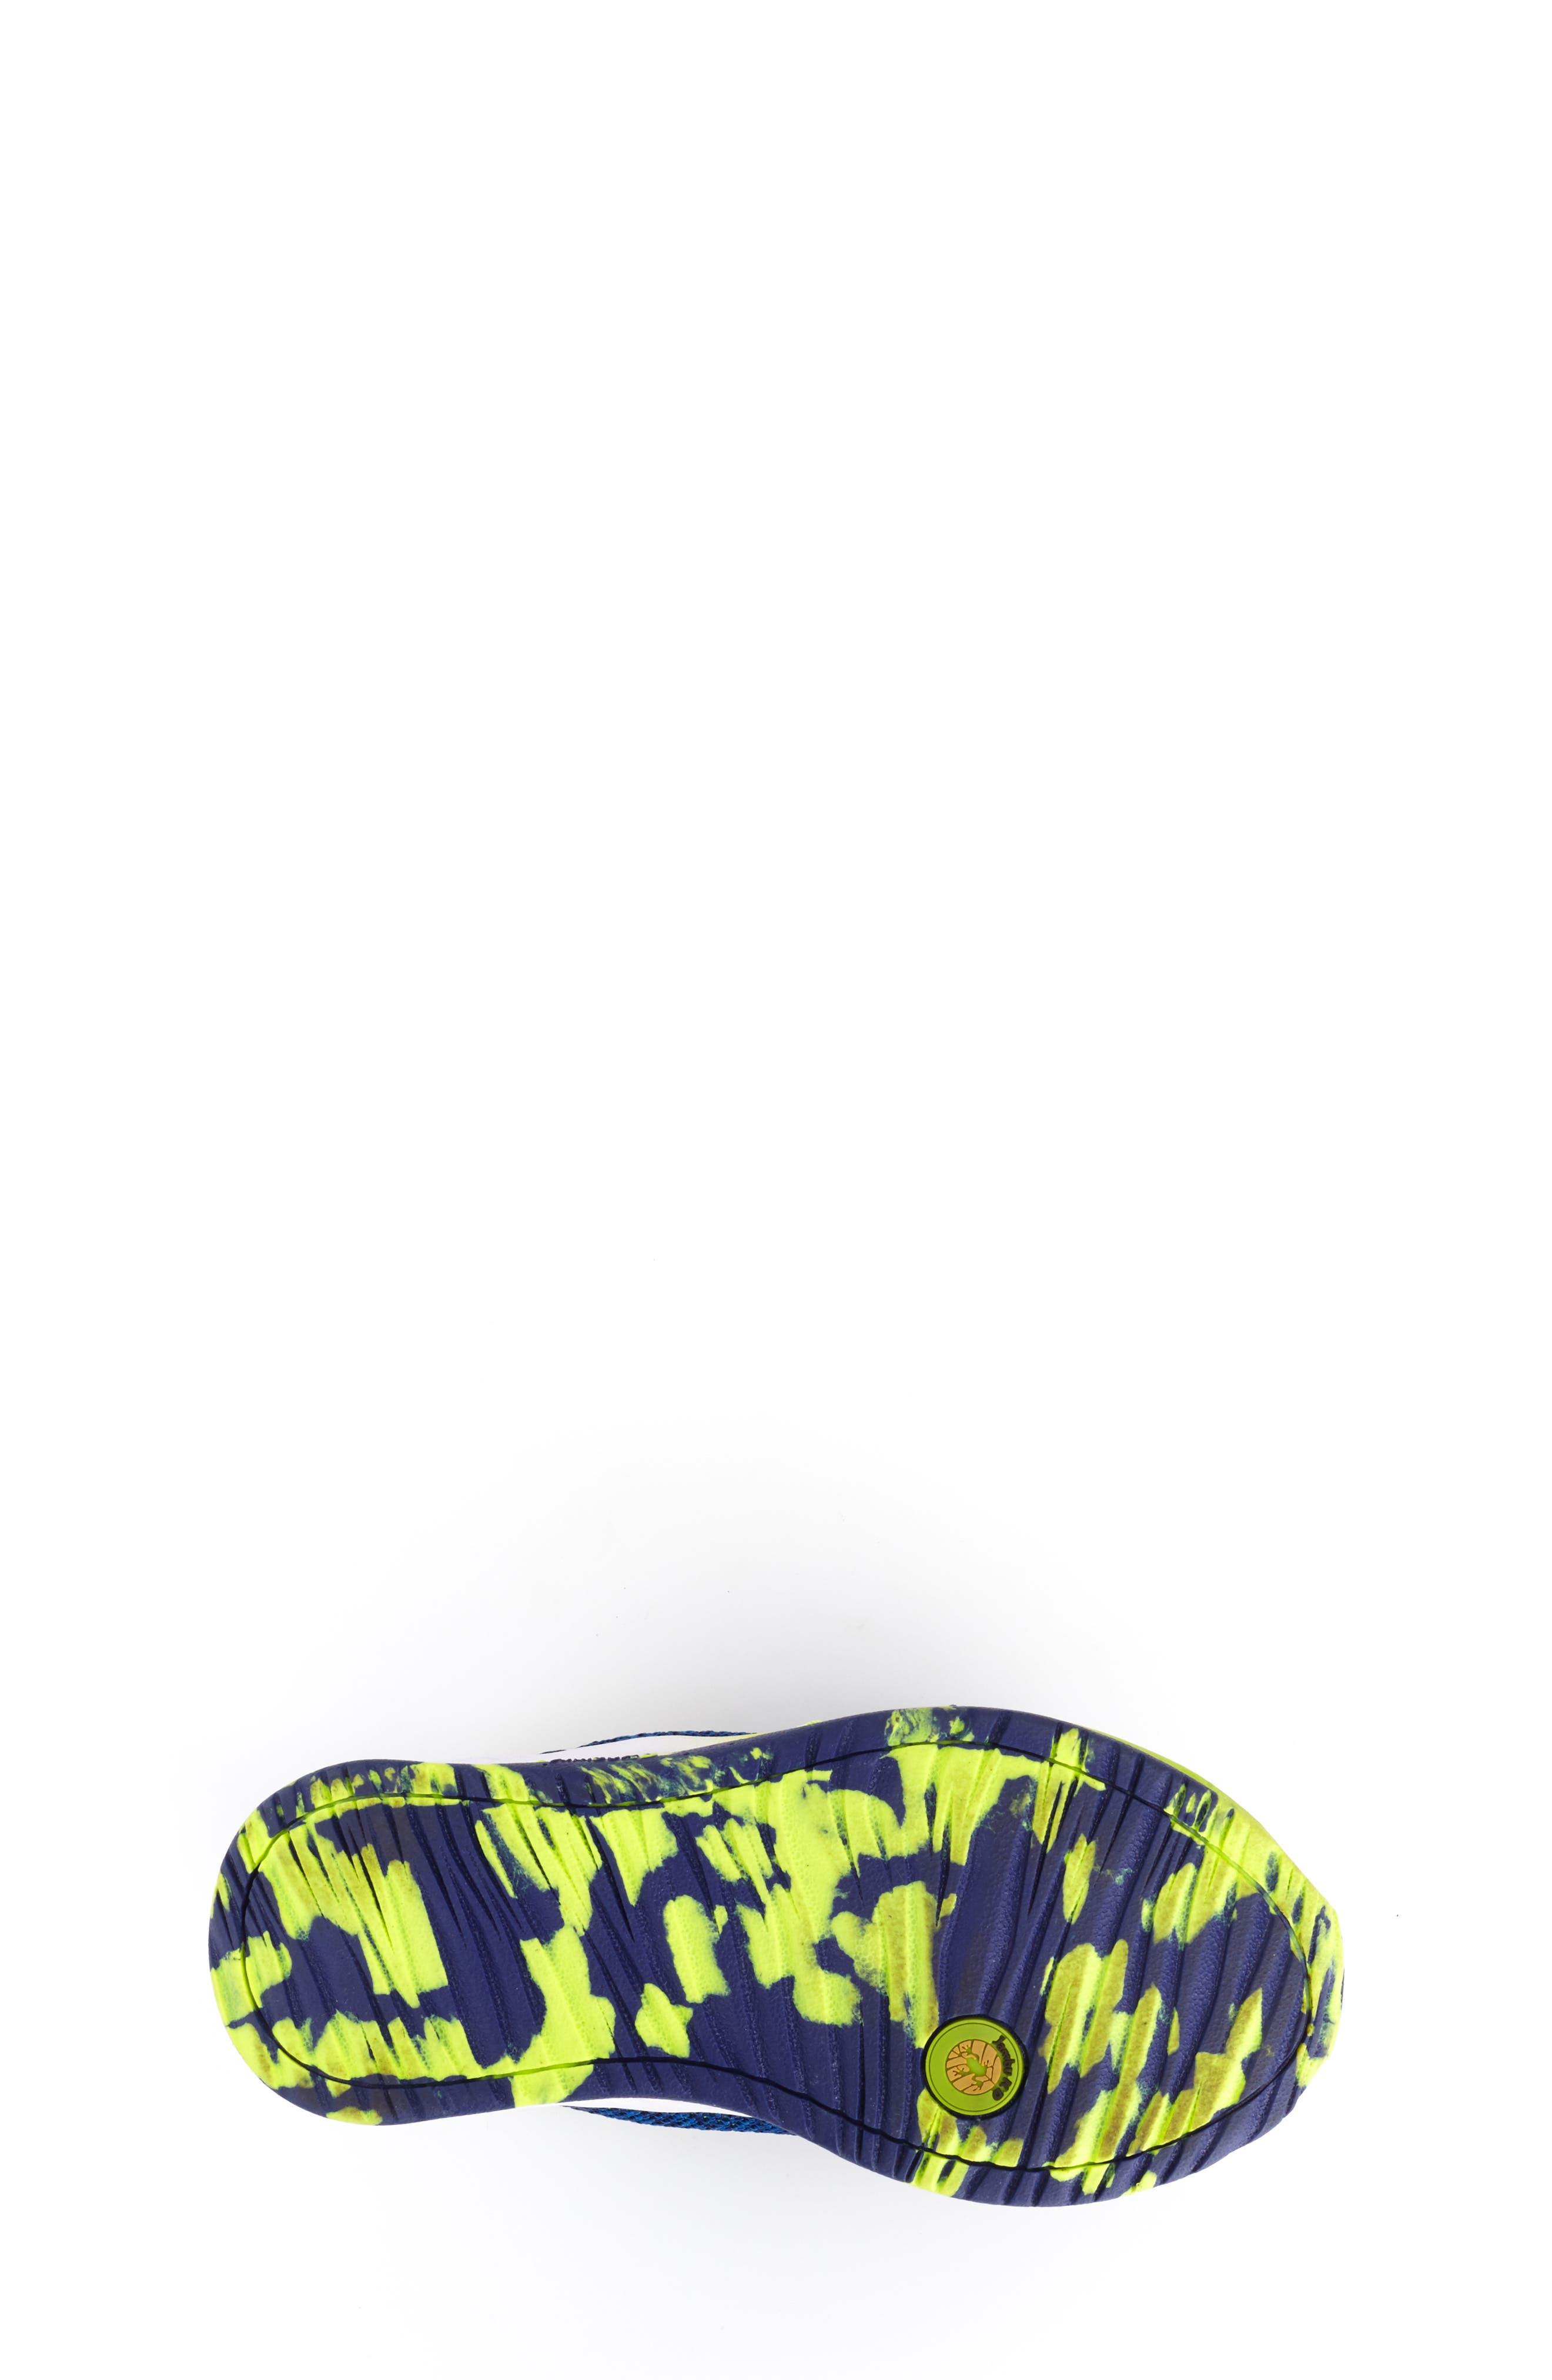 Talon Knit Sneaker,                             Alternate thumbnail 5, color,                             NAVY TEXTILE